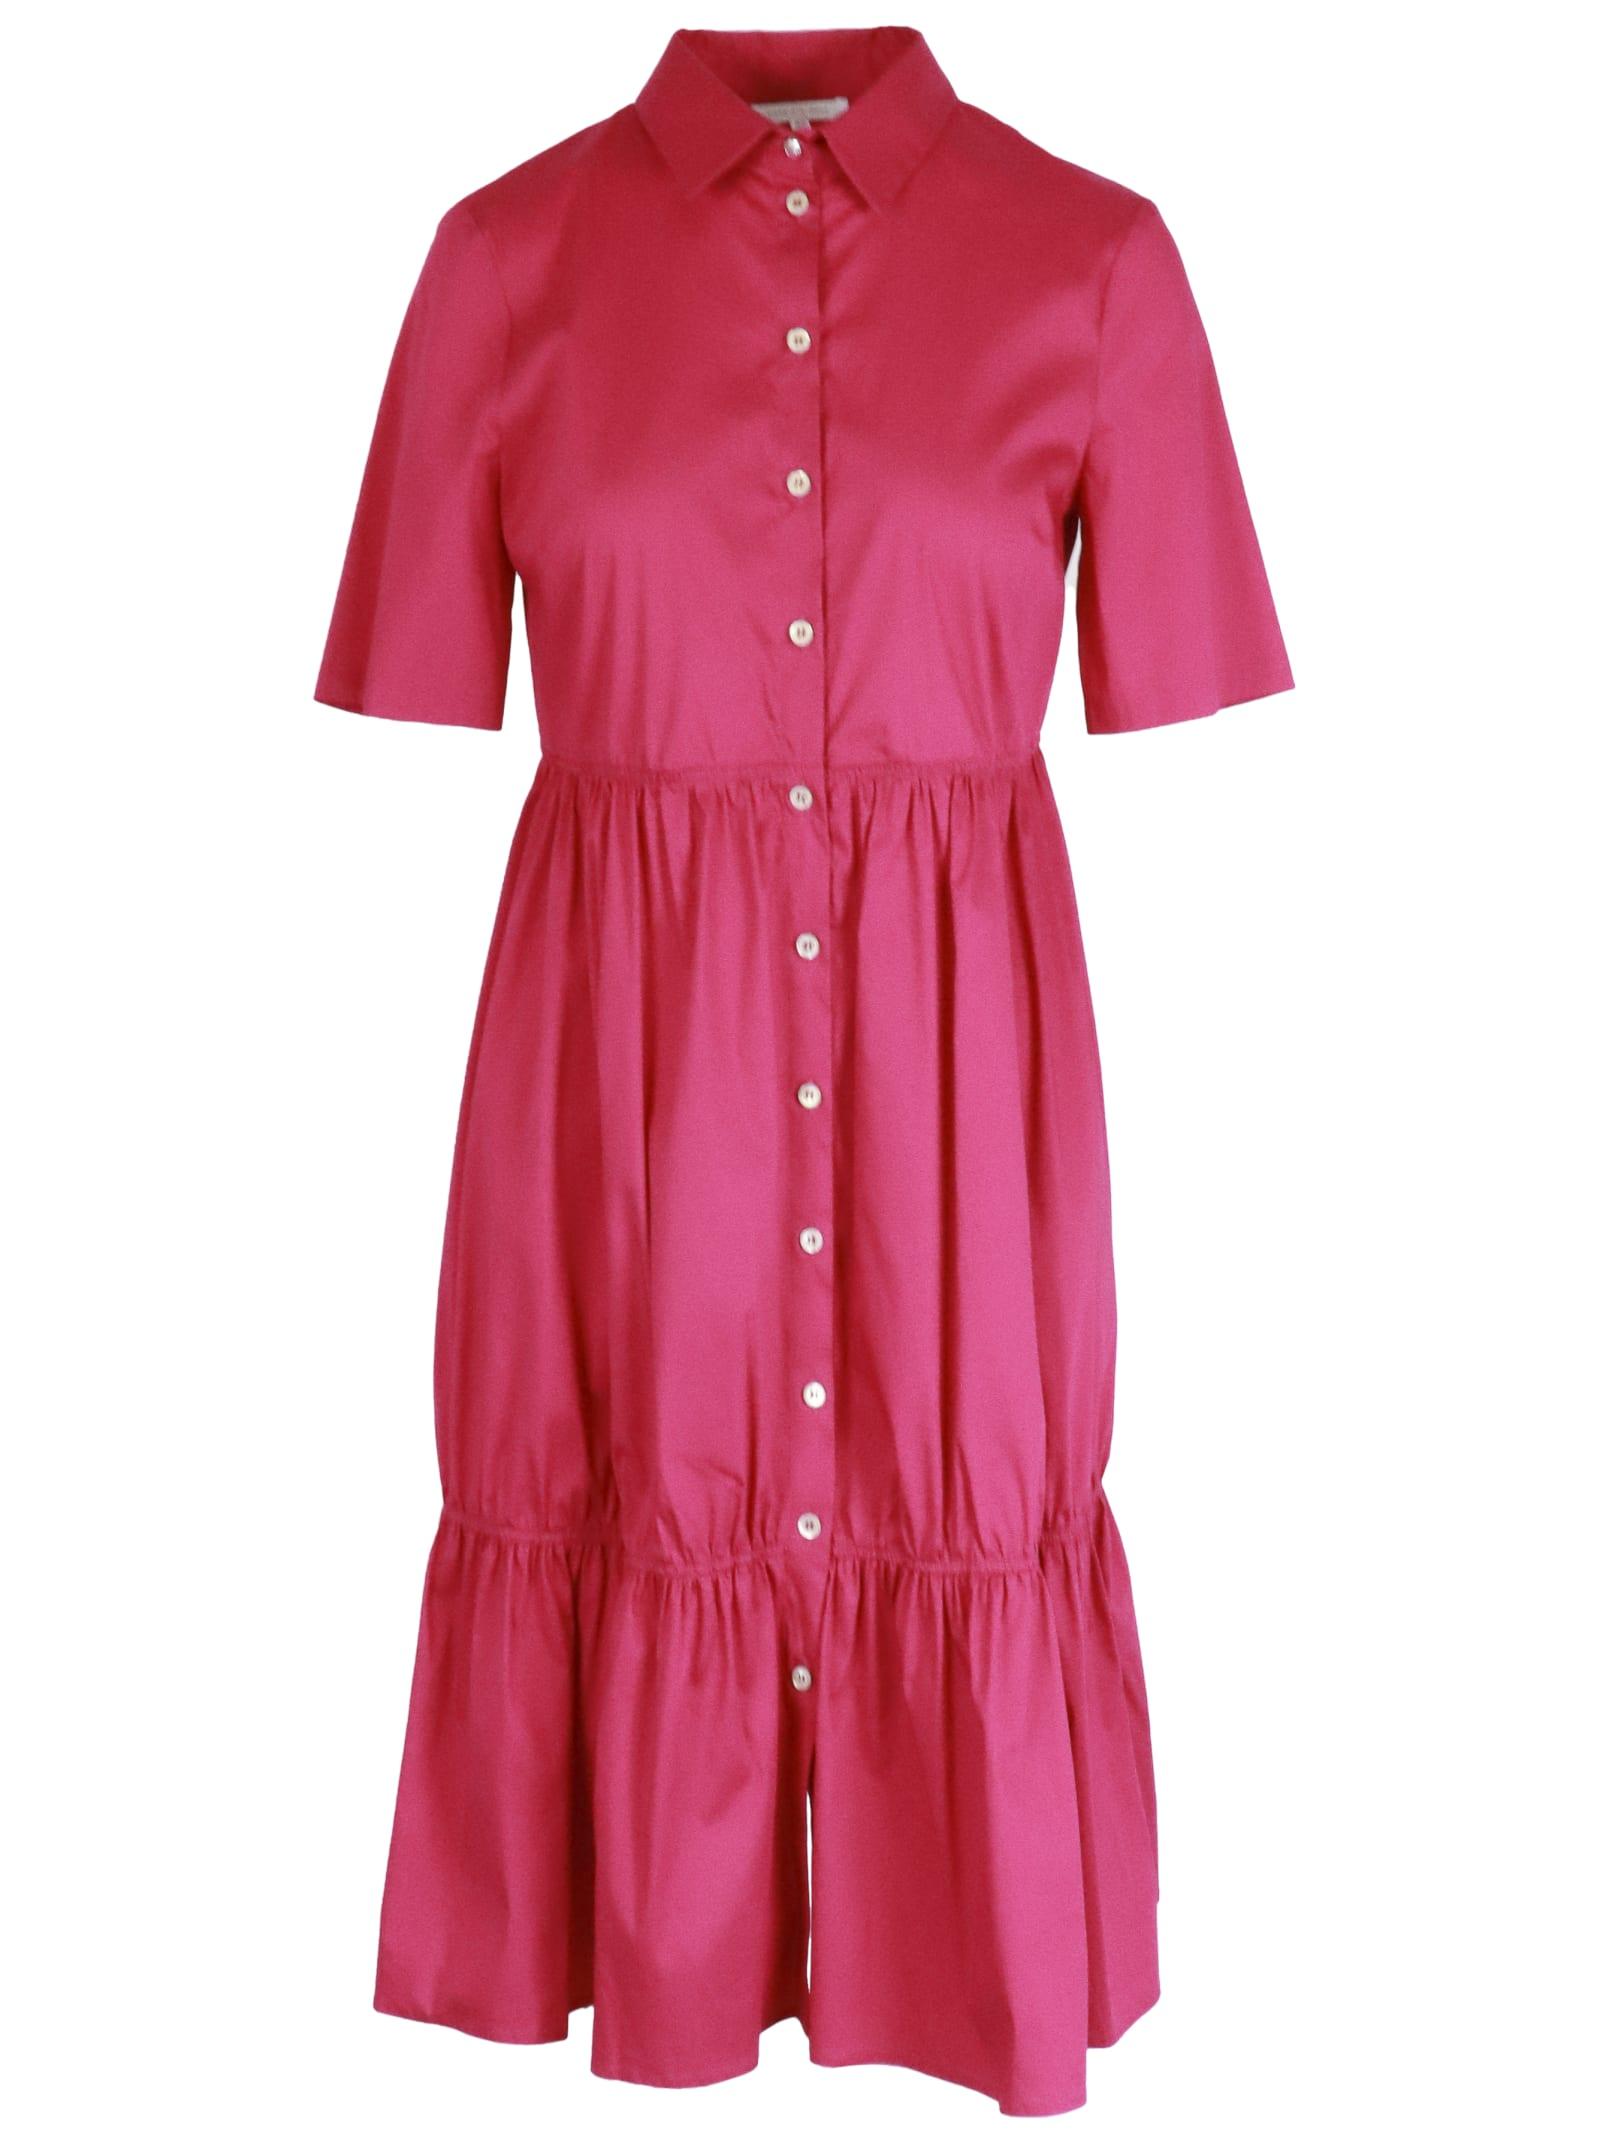 Buy Patrizia Pepe Azalea Cotton Mix Dress online, shop Patrizia Pepe with free shipping